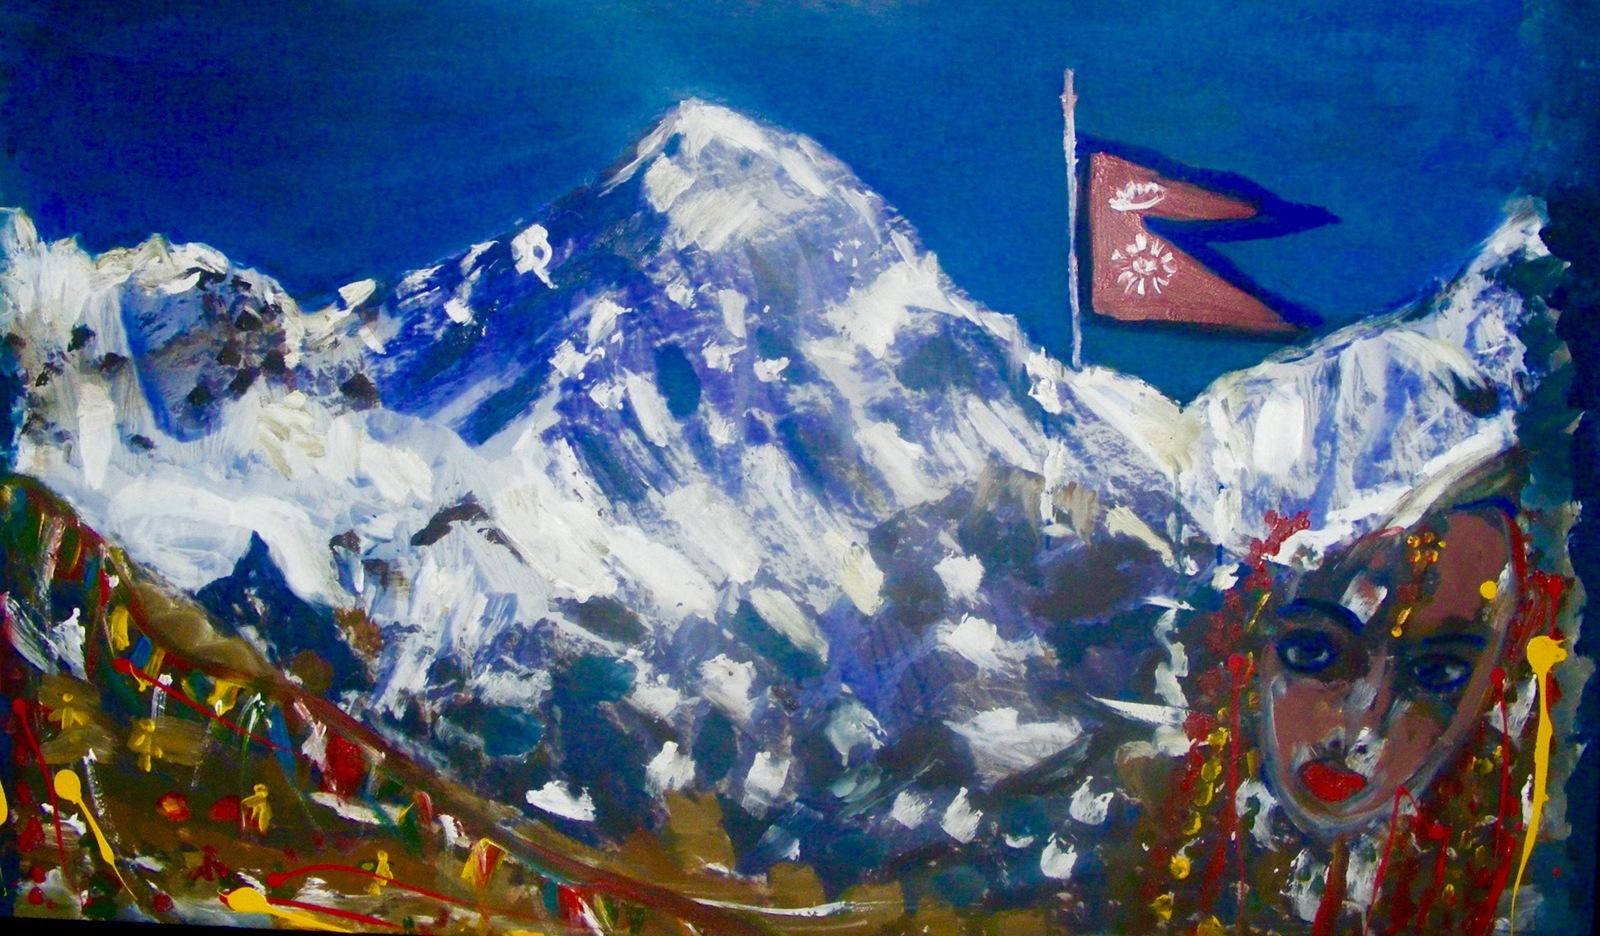 Rinaudo_Katarina_I_colori_del_Nepal